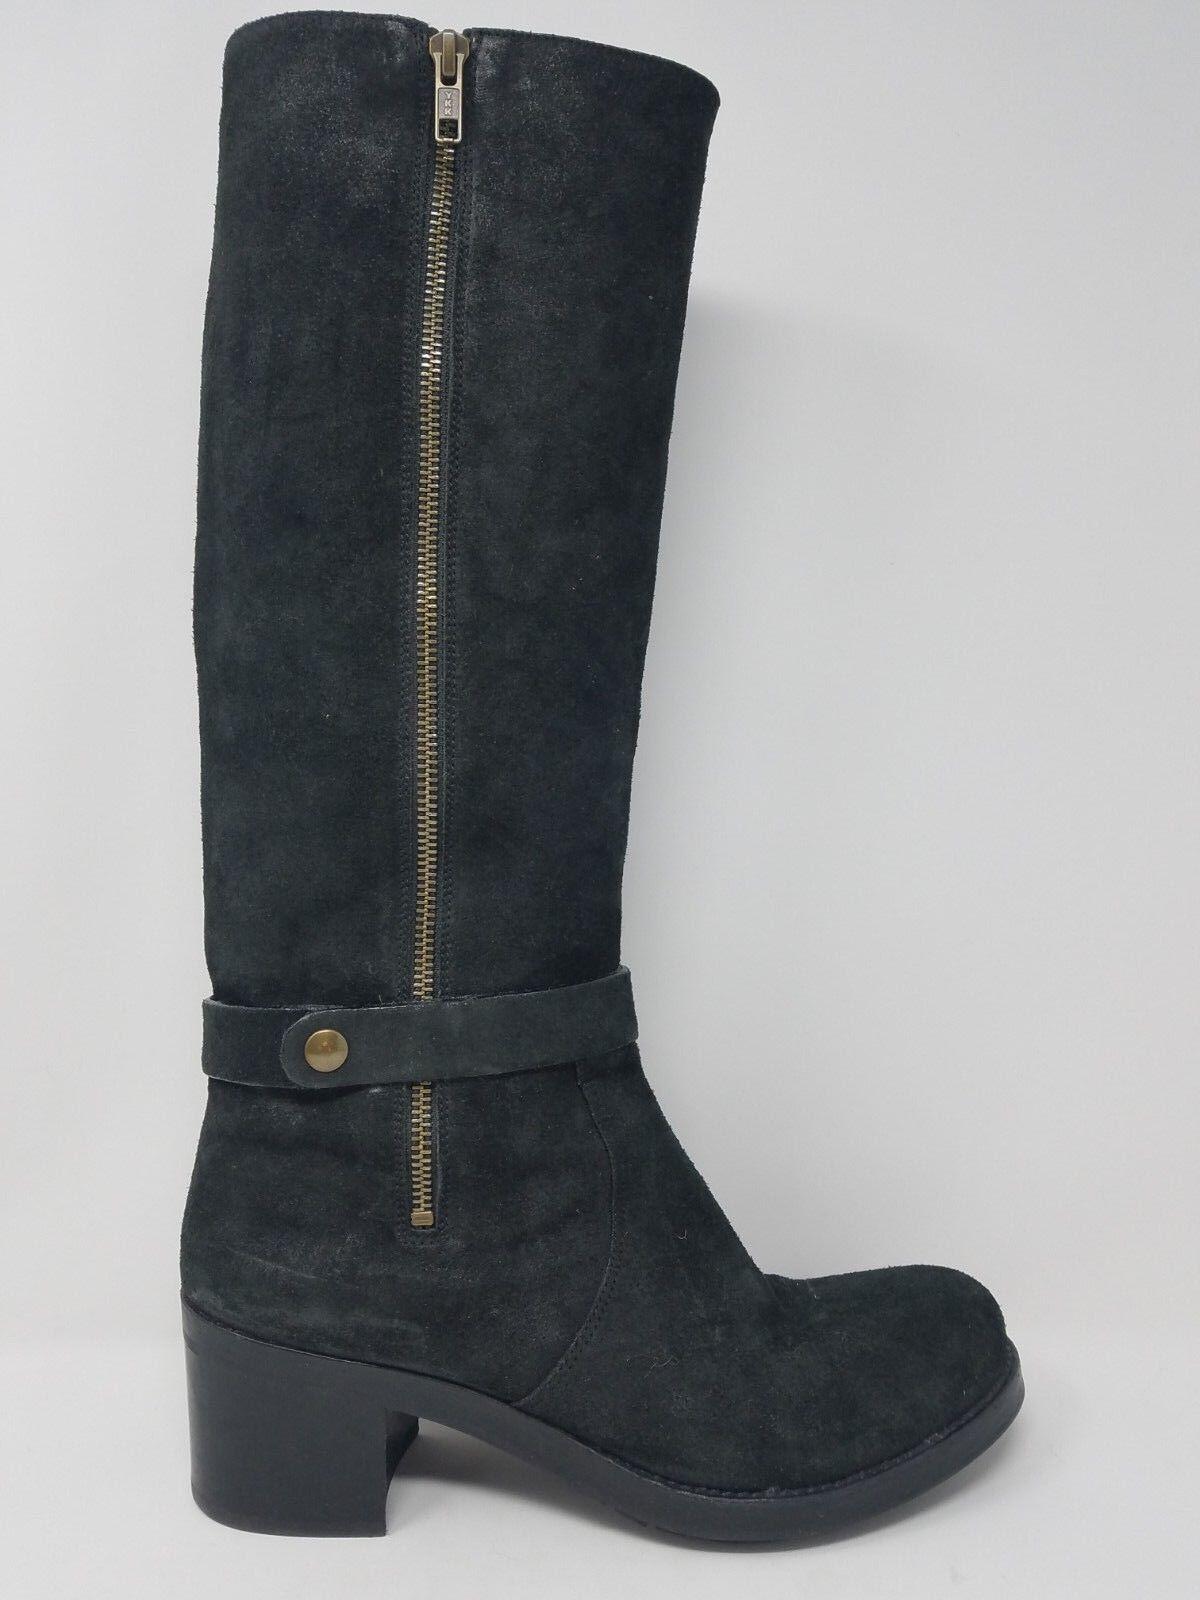 Roberto Del Carlo Womens Knee Boot Size 10 US 40 EU Black Leather Harness Zip Up